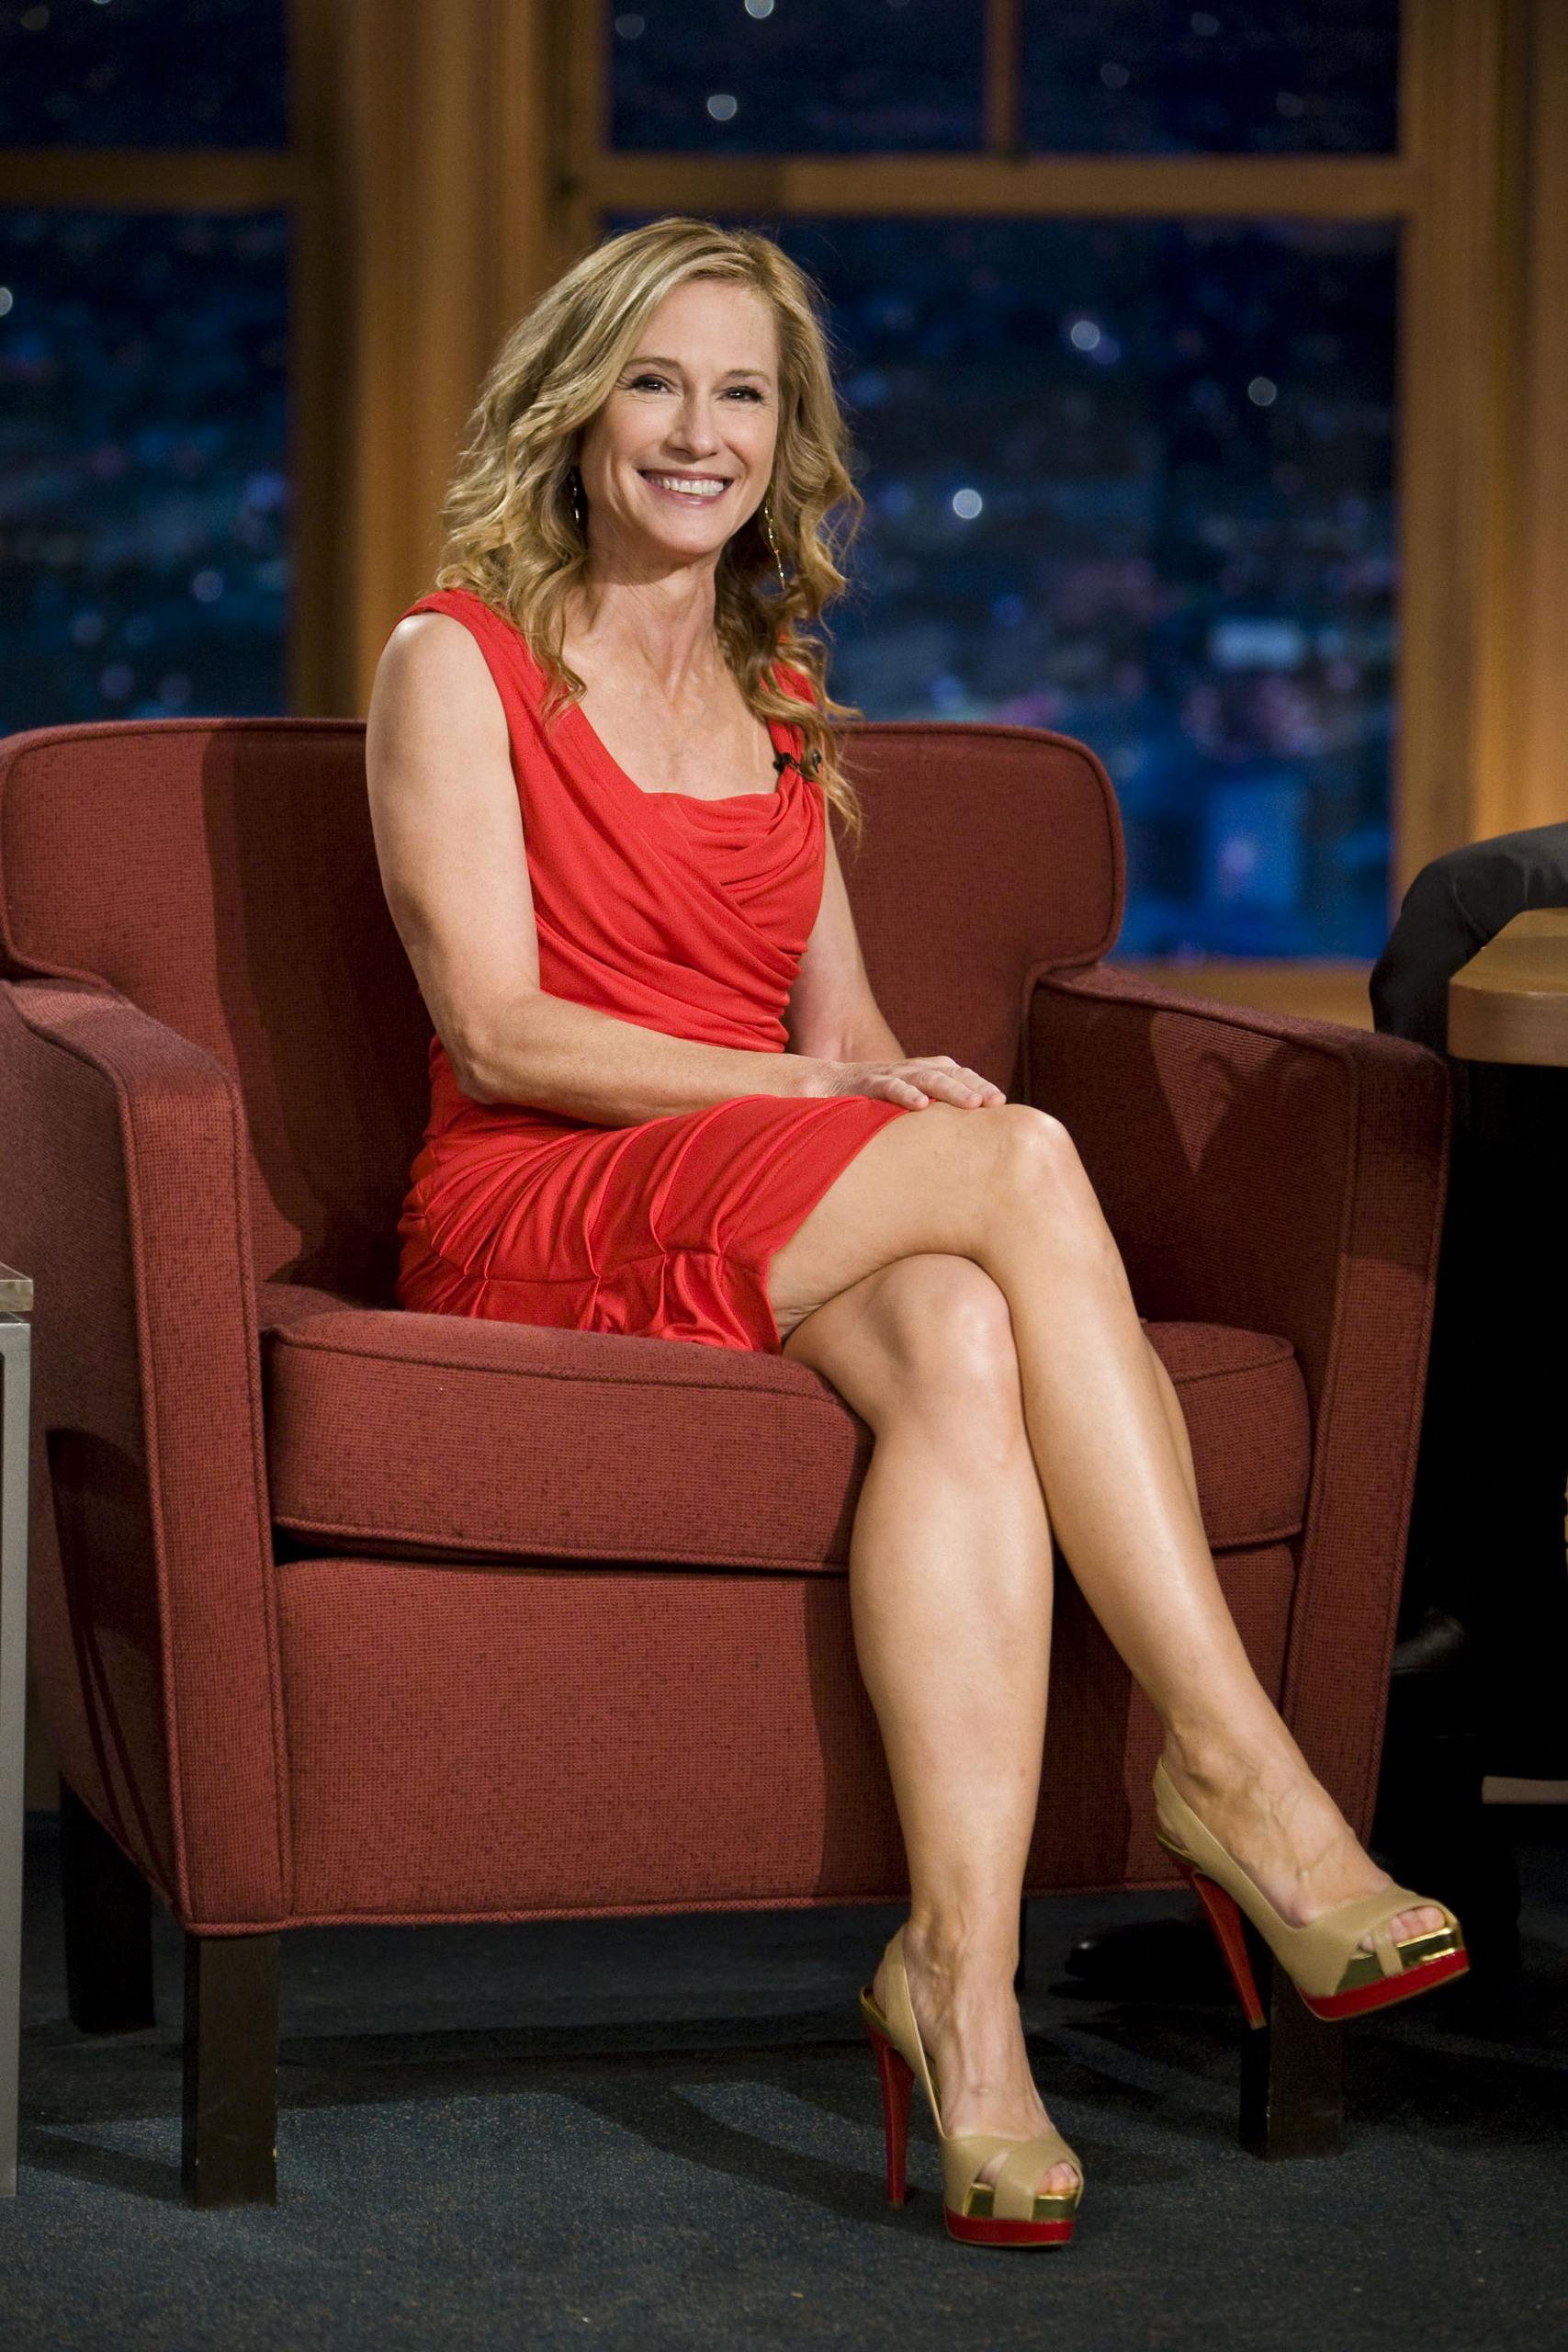 Jennifer vaughn nude Nude Photos